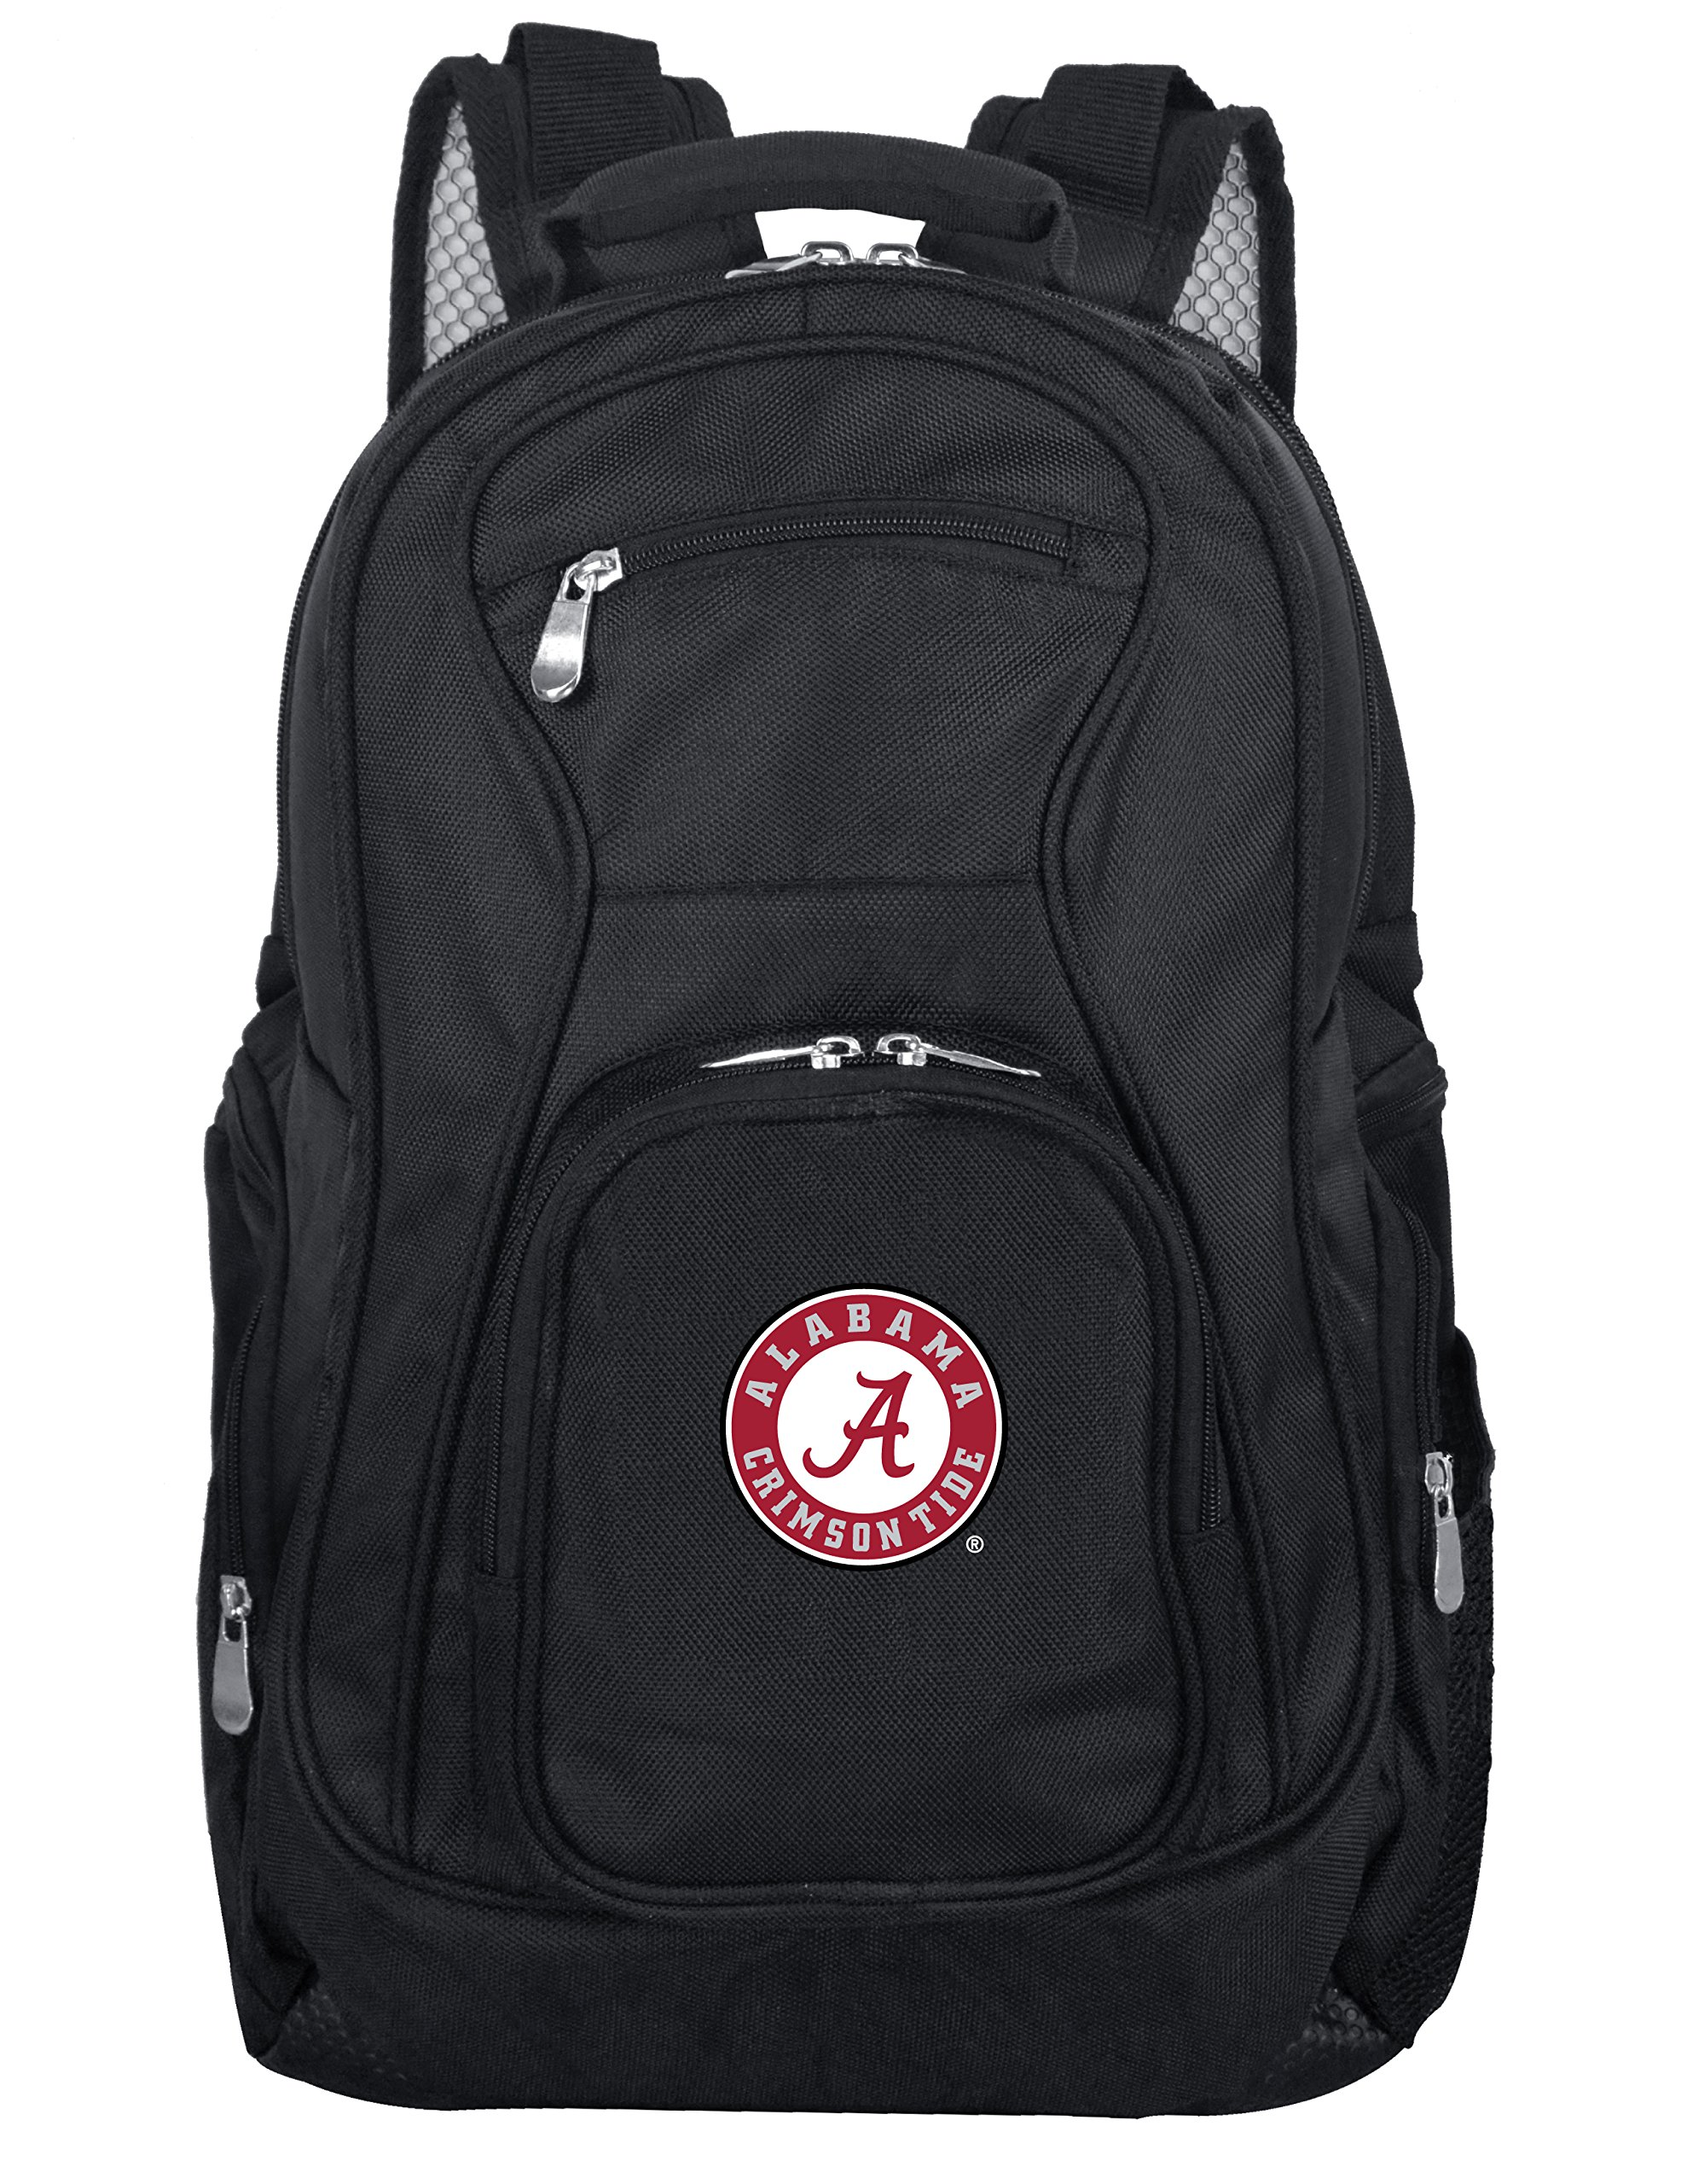 Denco NCAA Alabama Crimson Tide Voyager Laptop Backpack, 19-inches, Black